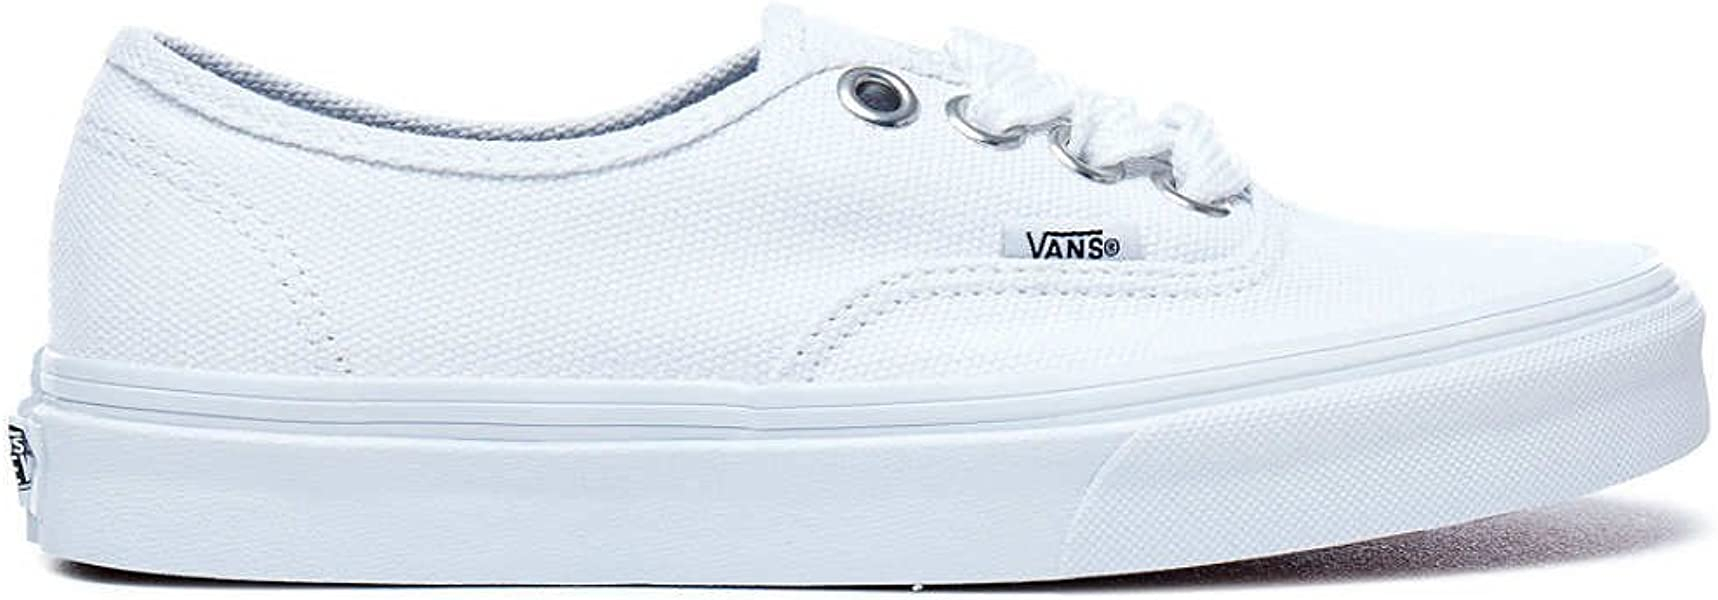 5a5db7ee280098 Vans Unisex Adult (Q9G) (Oversized Lace) True White True White Authentic